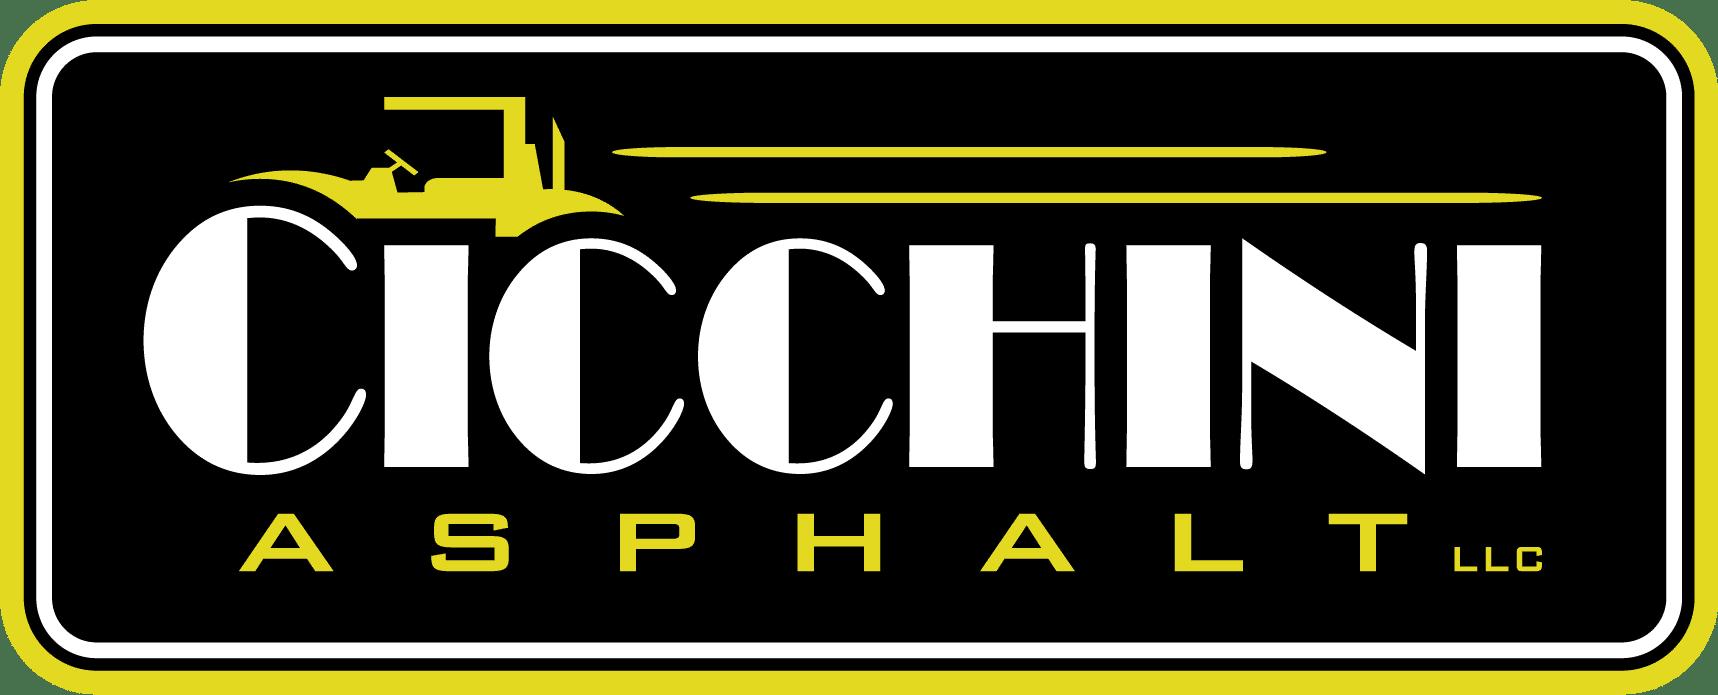 Cicchini Asphalt